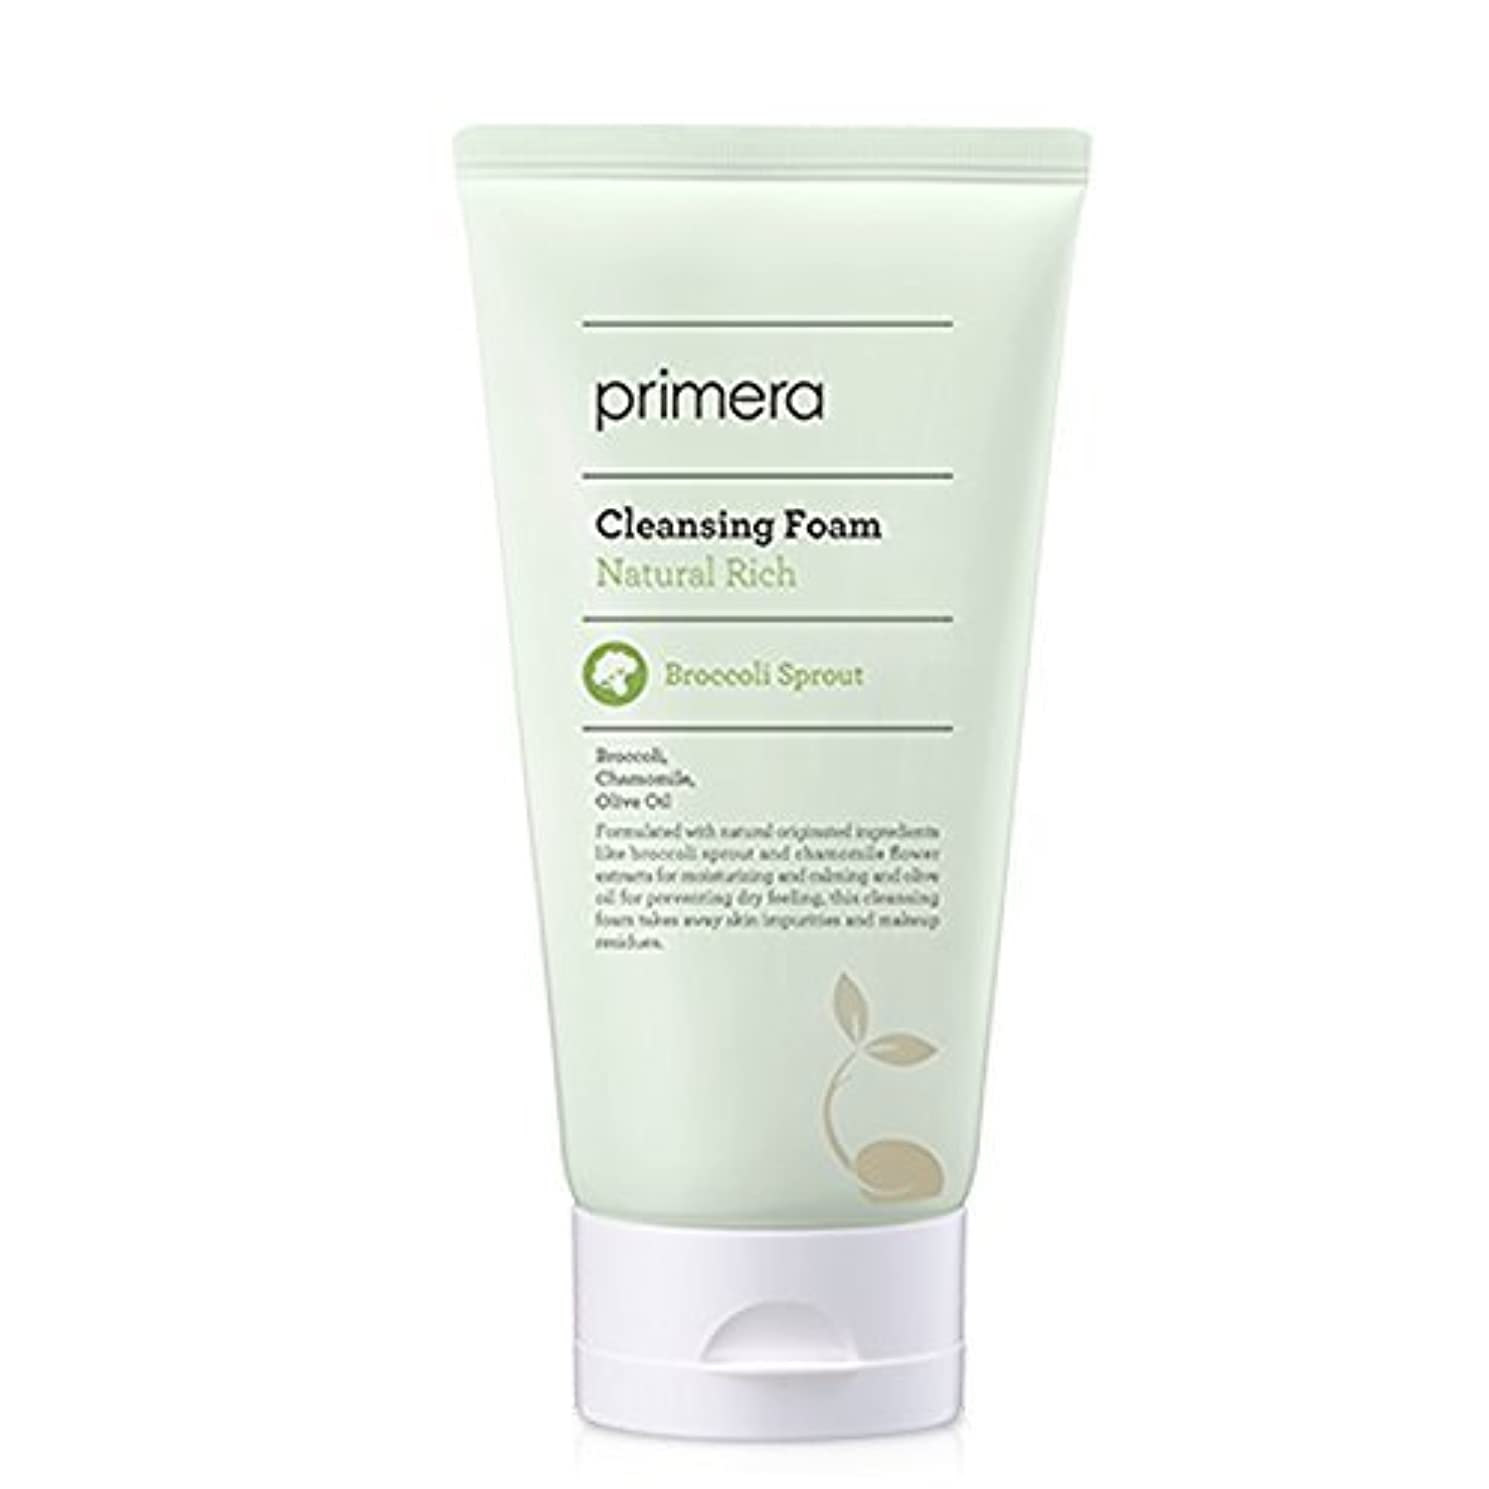 Primera Technology [プリメーラ]自然の豊かなクレンジング フォーム 150 Ml [並行輸入品]